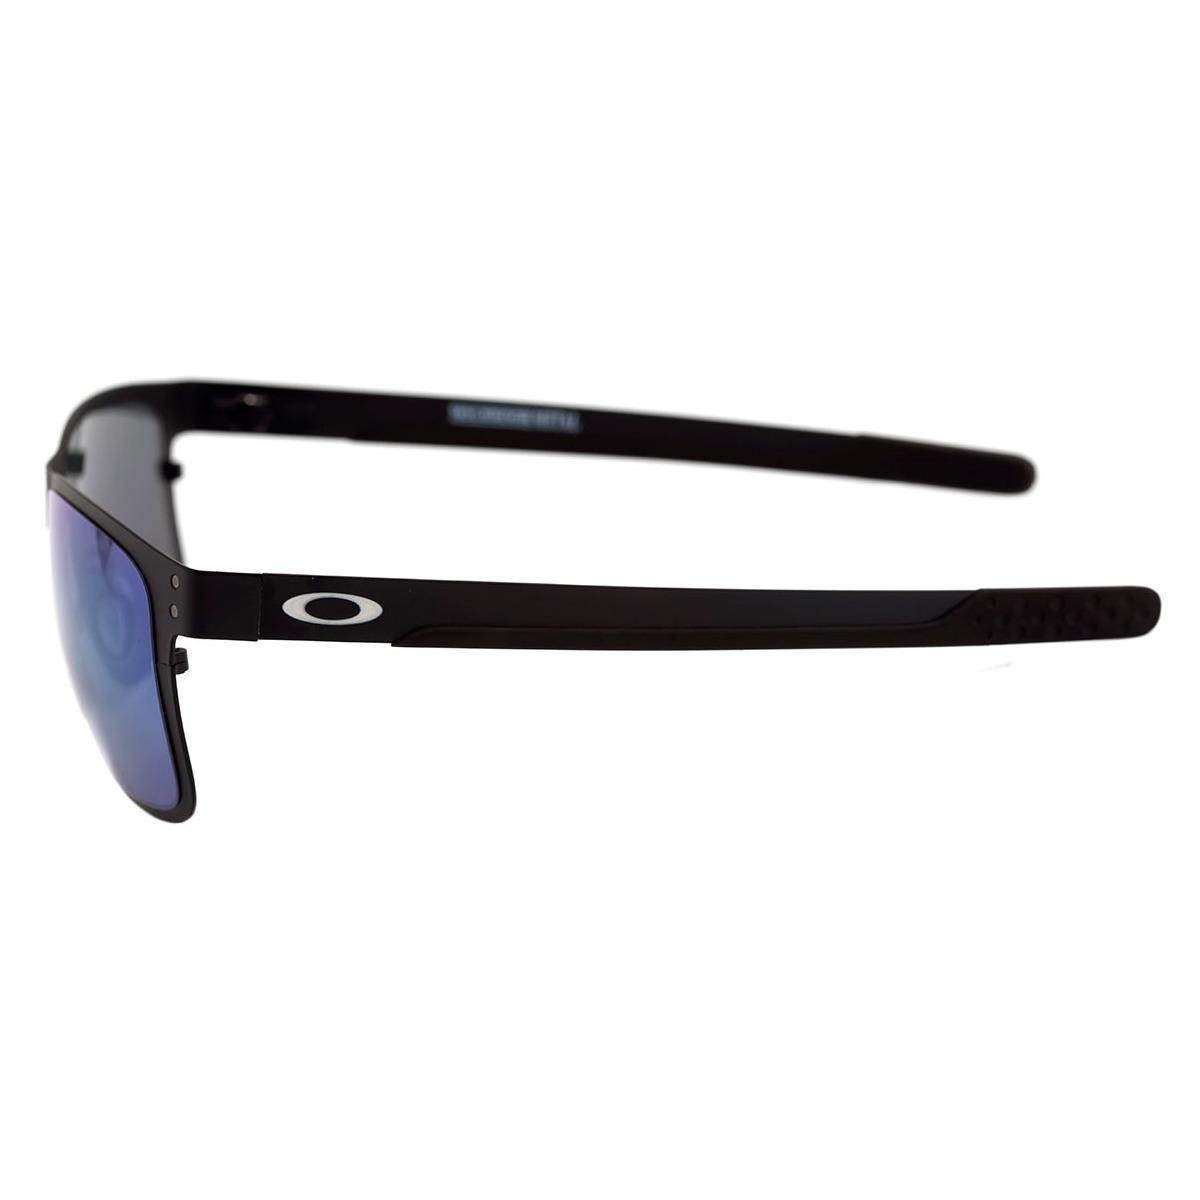 b613ef47365bf Óculos Oakley Holbrook Metal Matte Black  Lente Jade Iridium - R ...